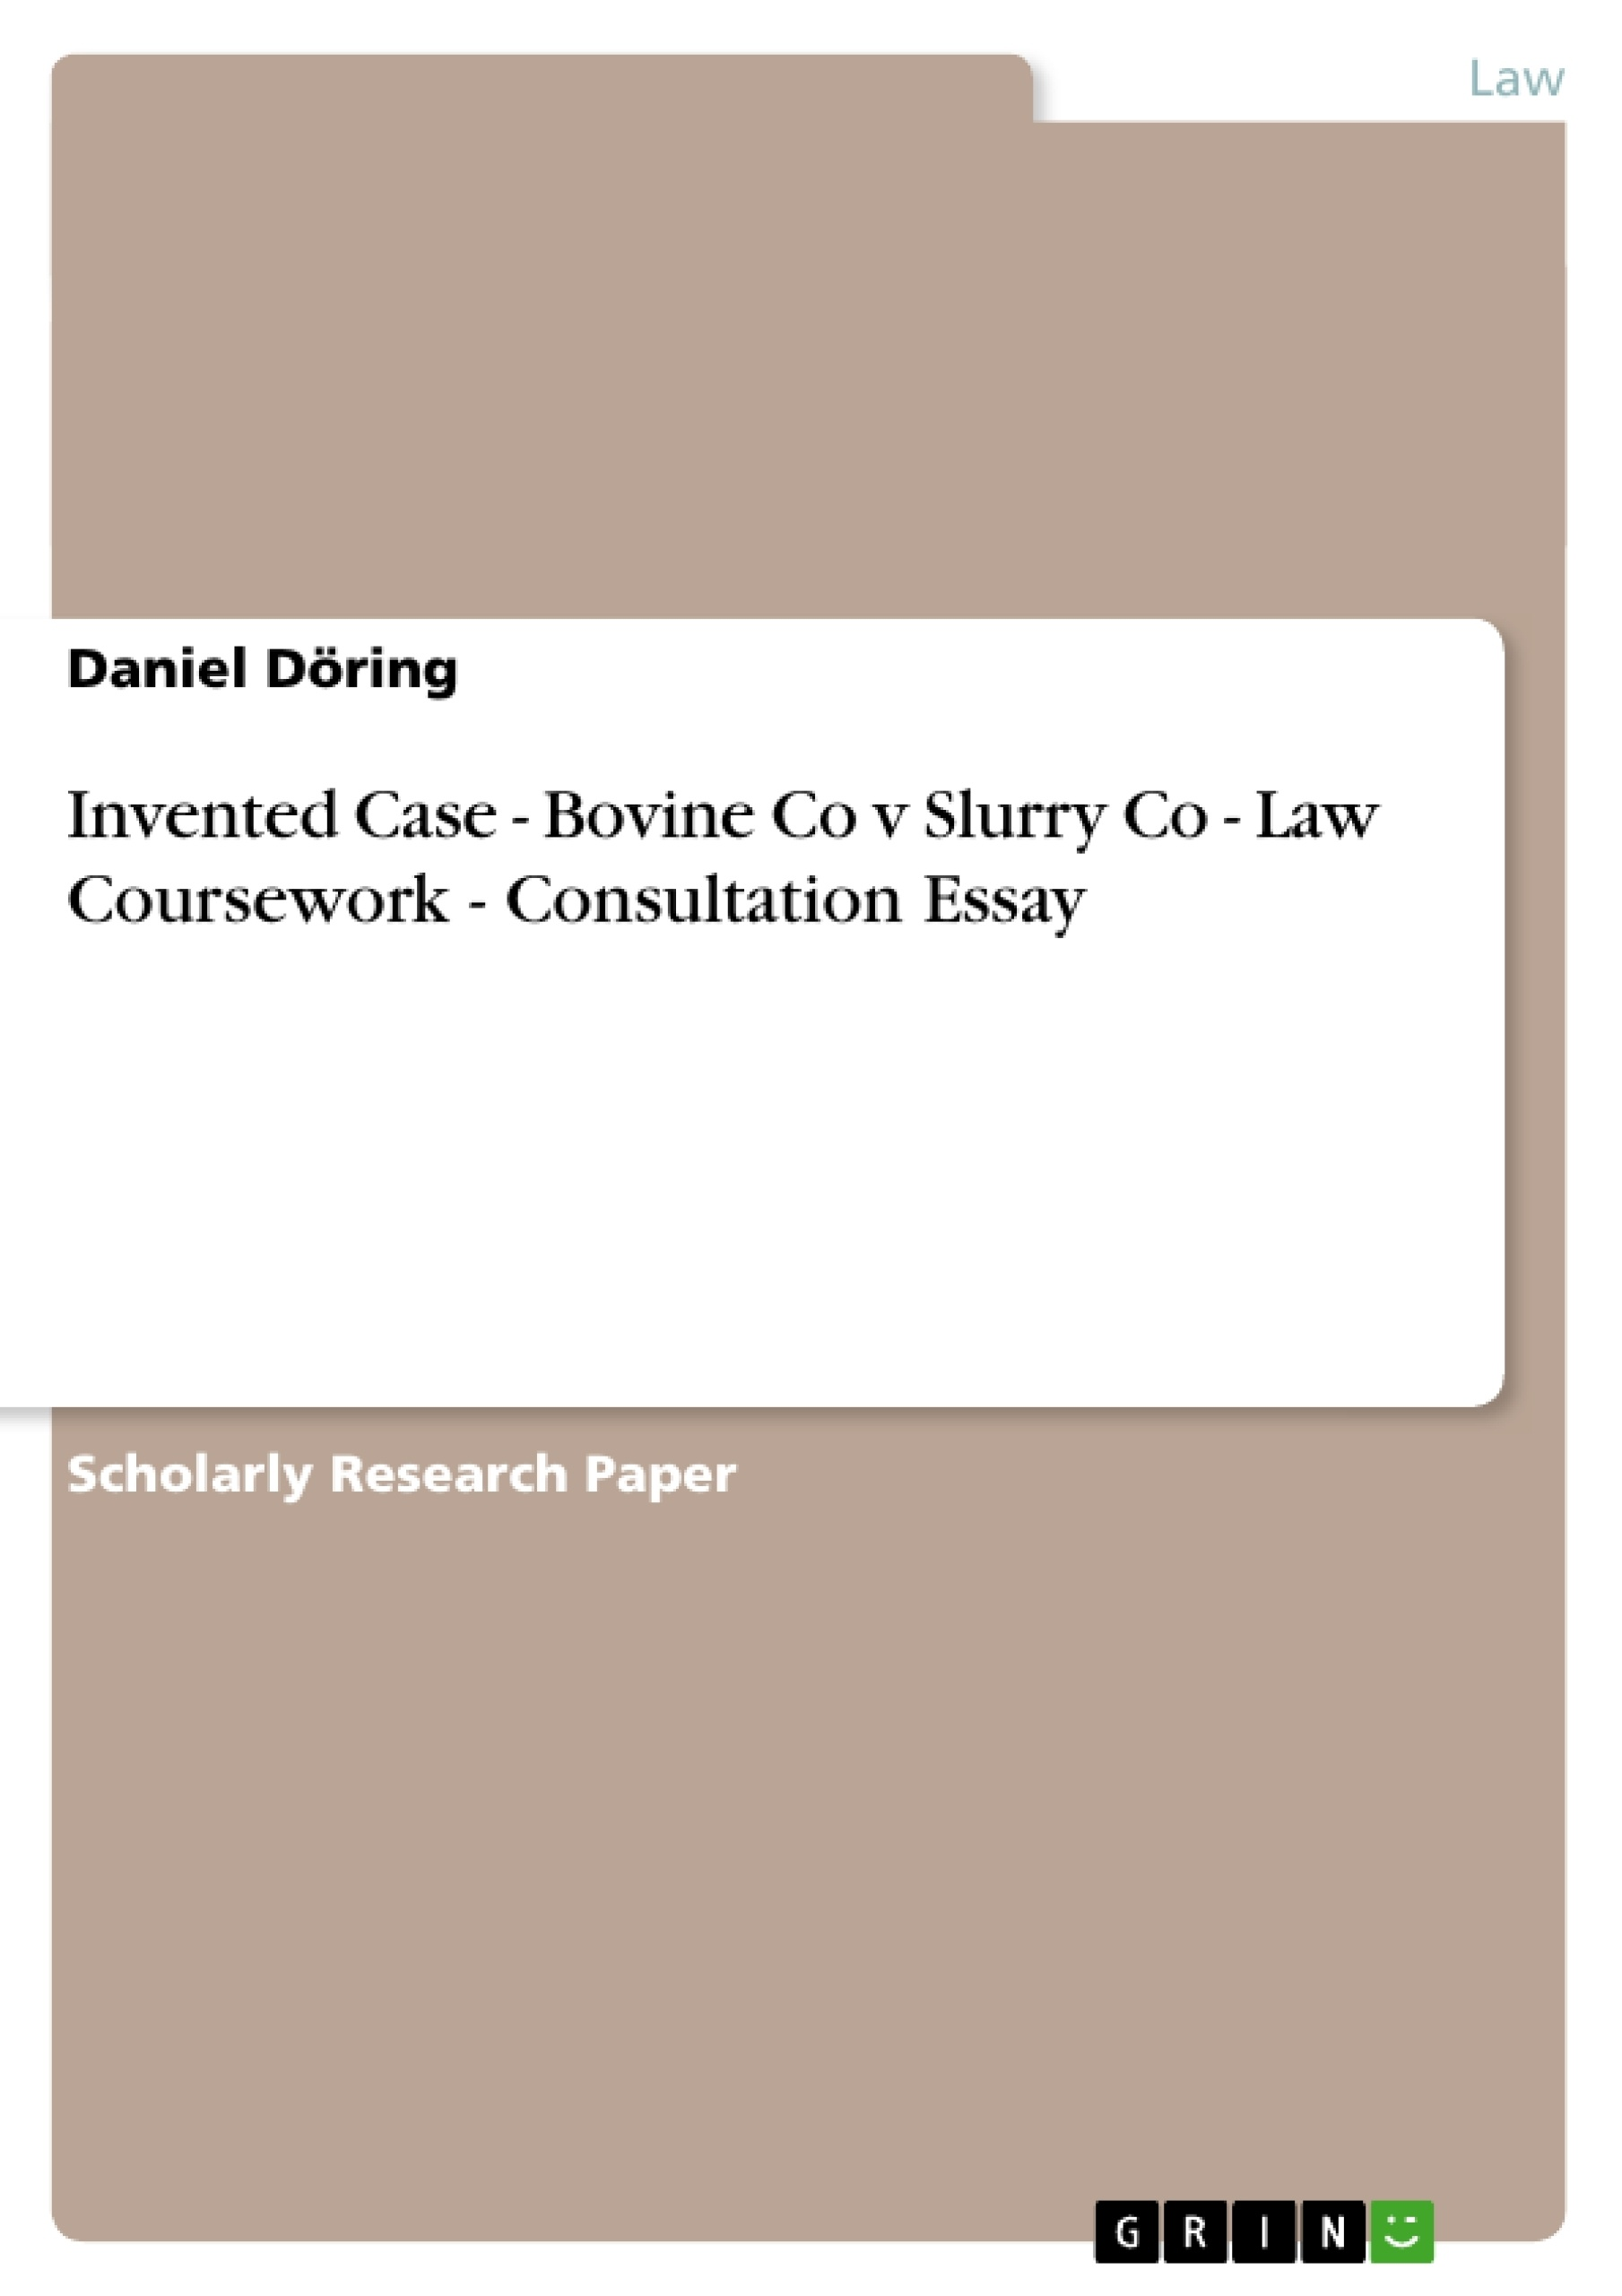 Title: Invented Case - Bovine Co v Slurry Co - Law Coursework -  Consultation Essay